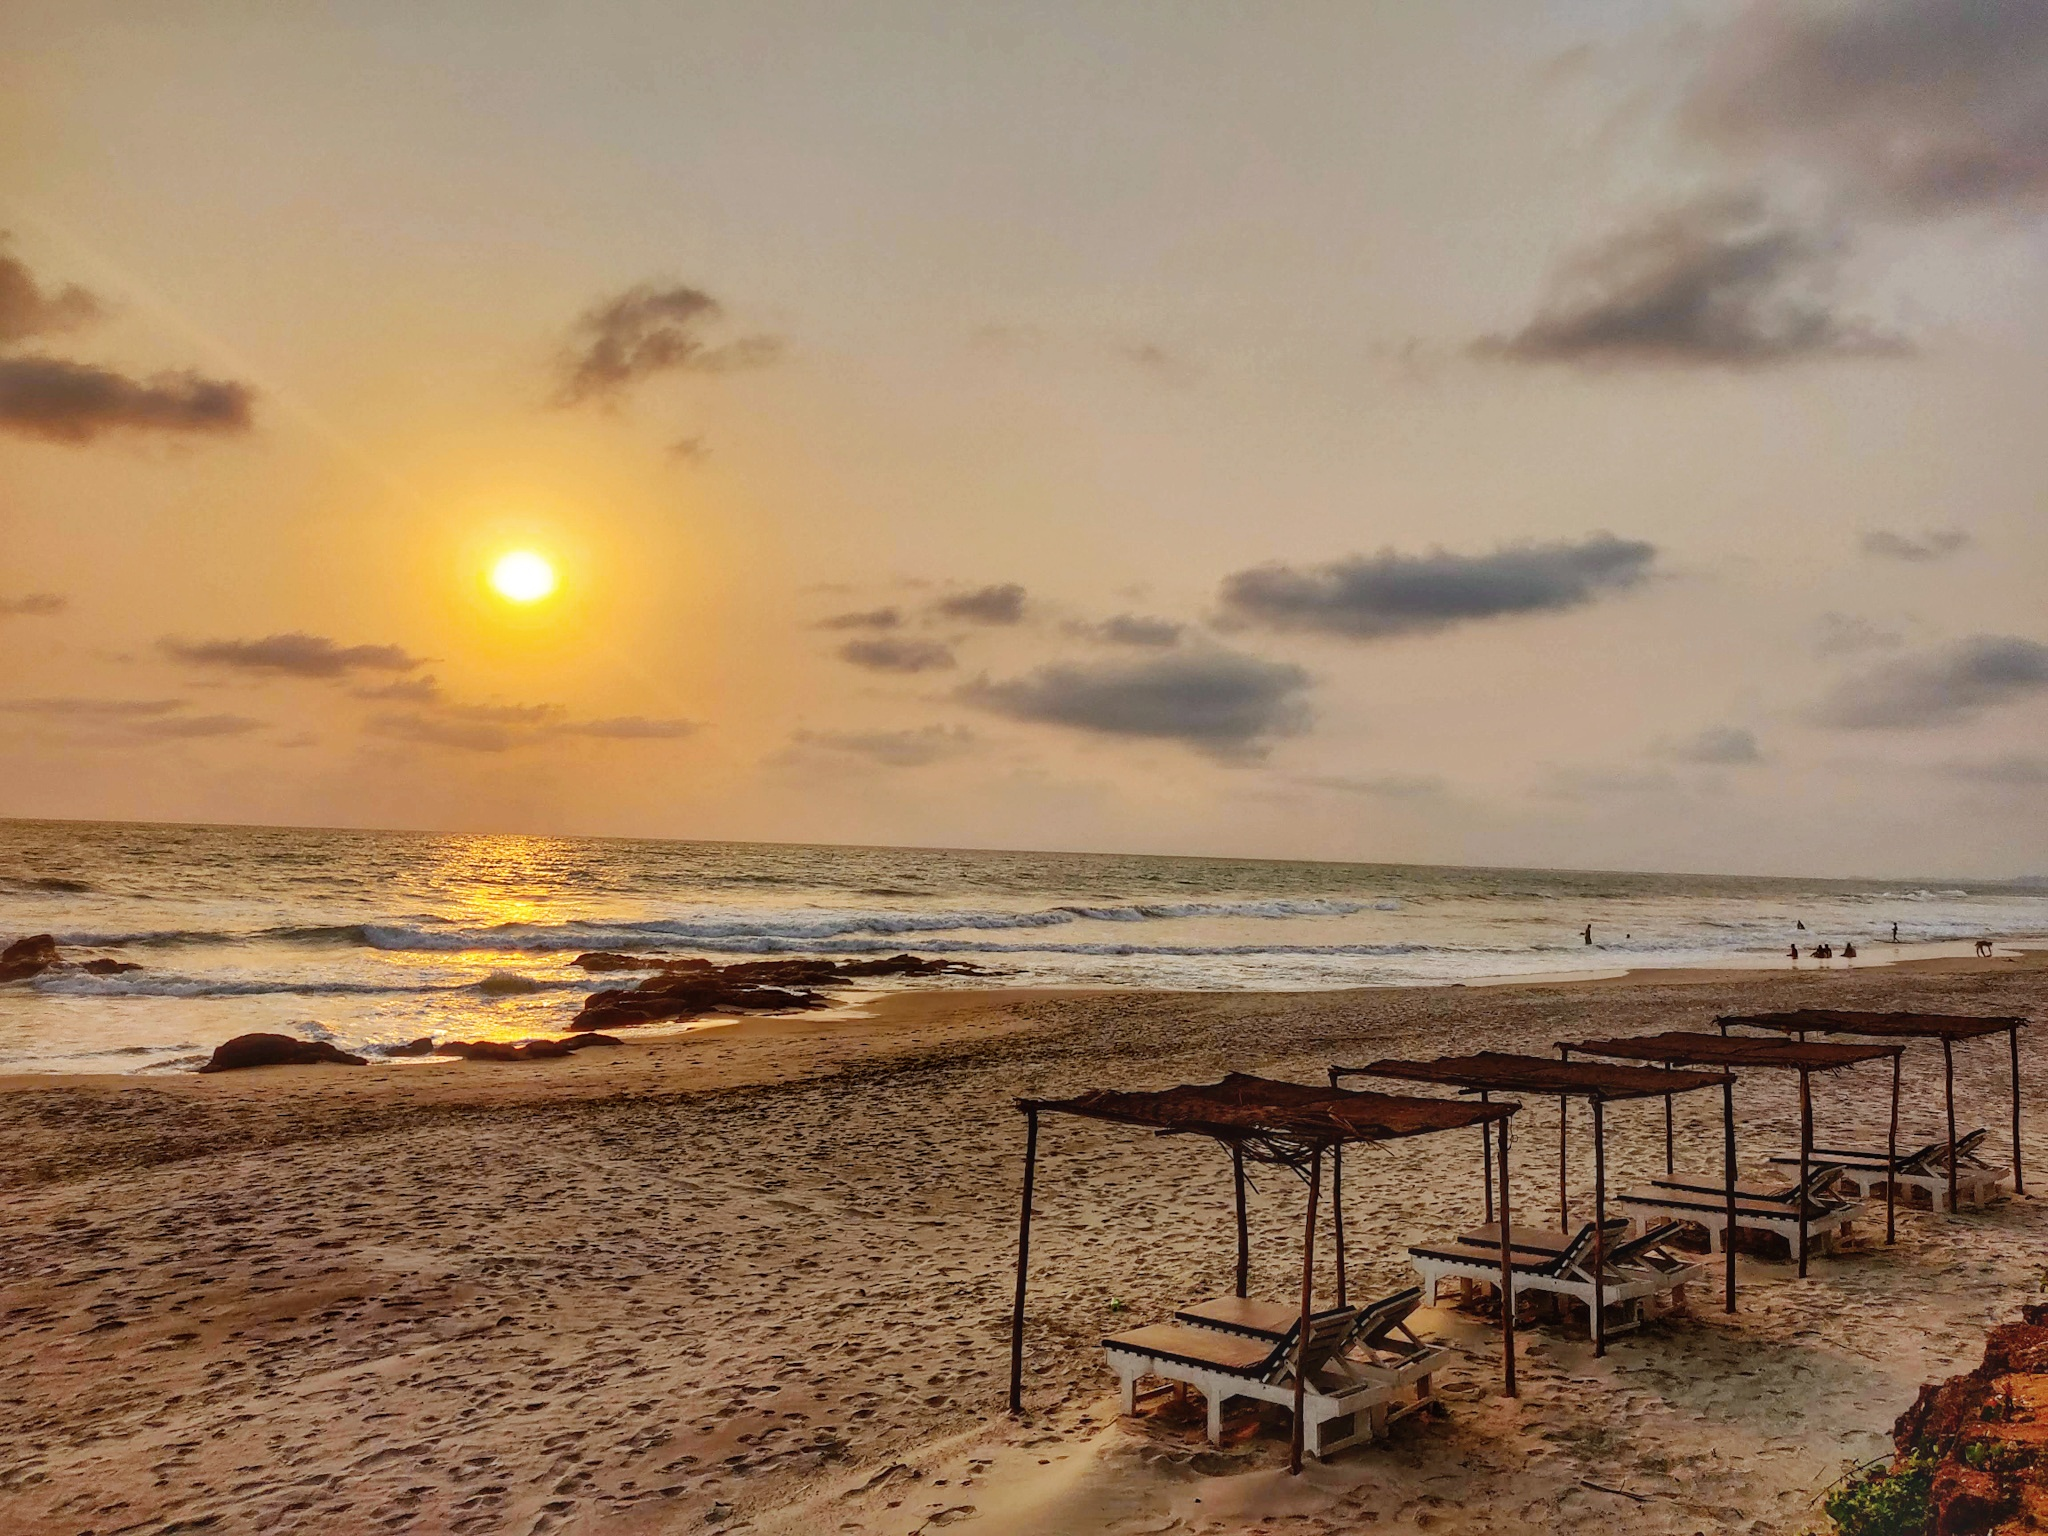 Walk by the Sea - by Vaibhav Sawatkar